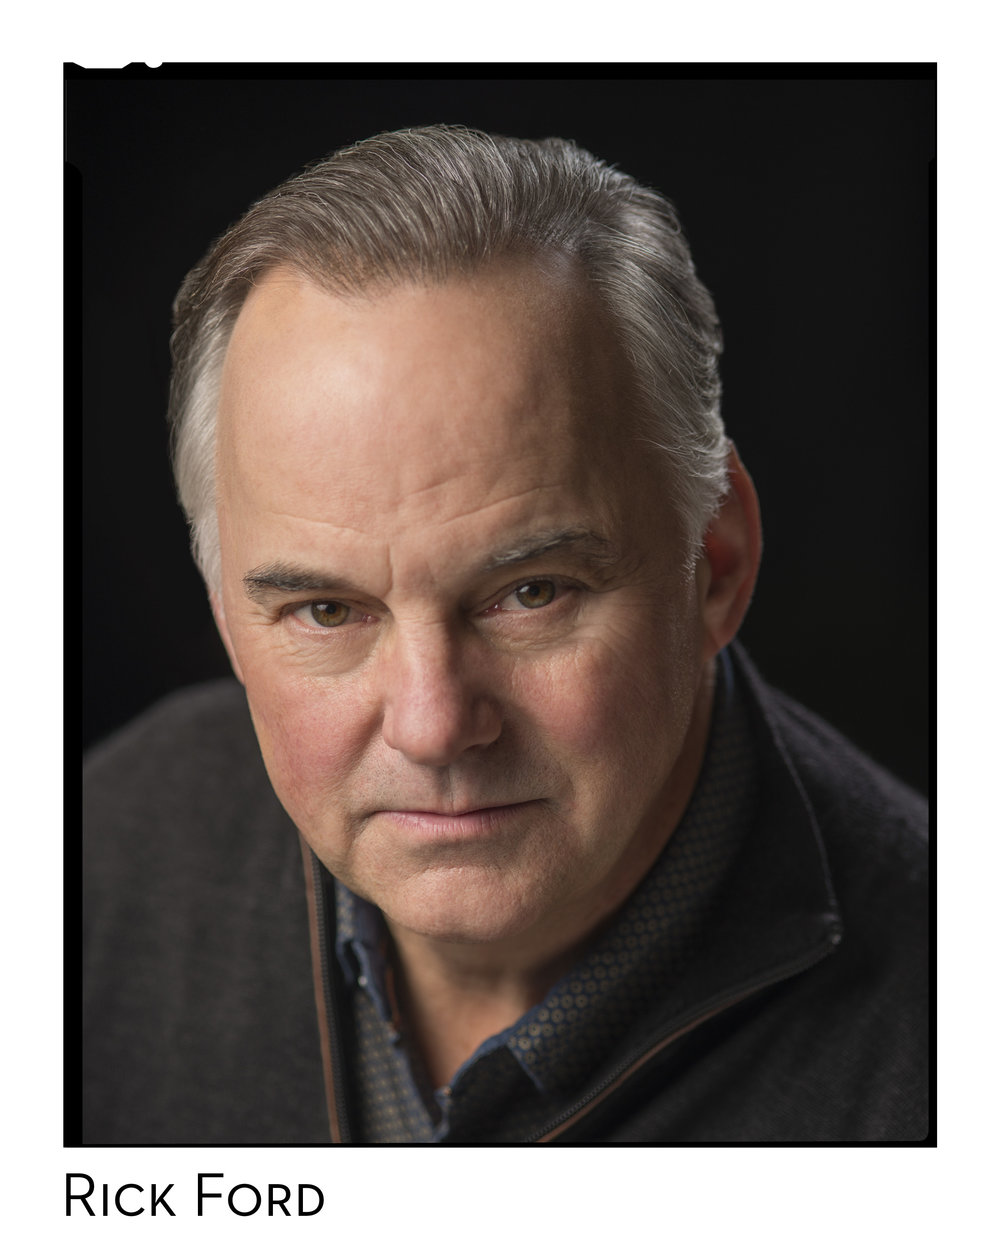 Rick Ford Headshot